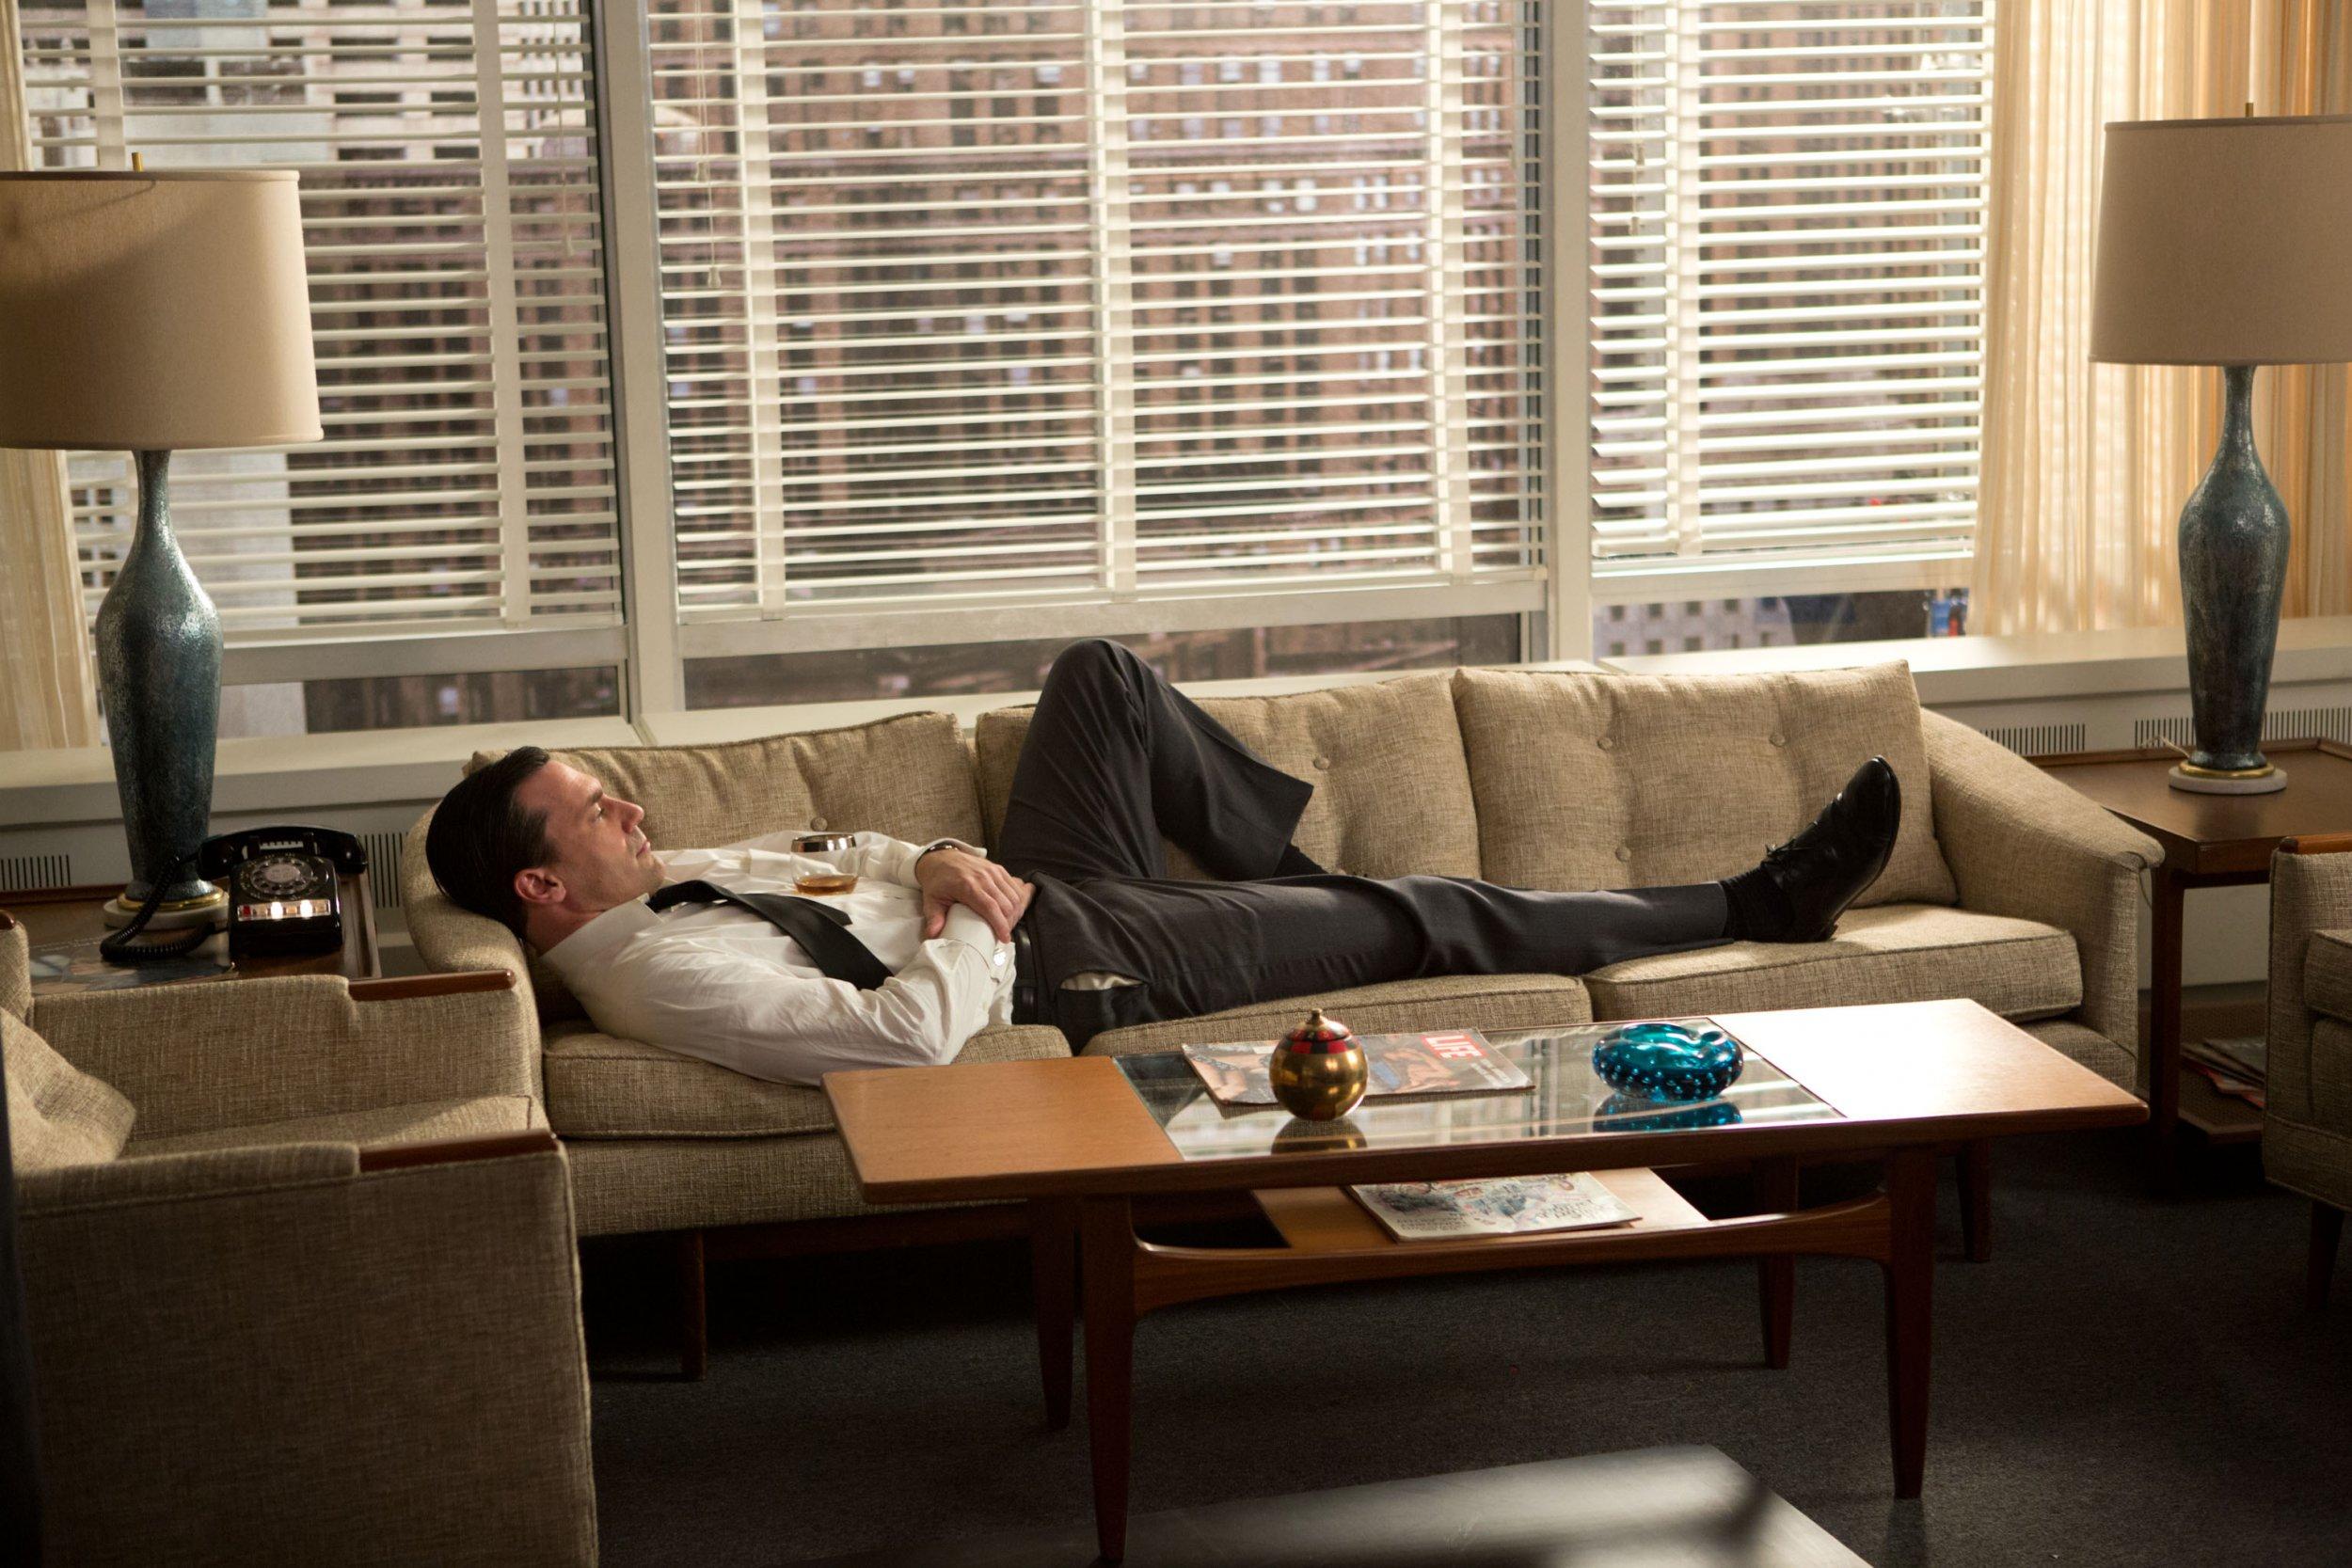 A Nostalgic New York Bids A Second Farewell To Mad Men Era